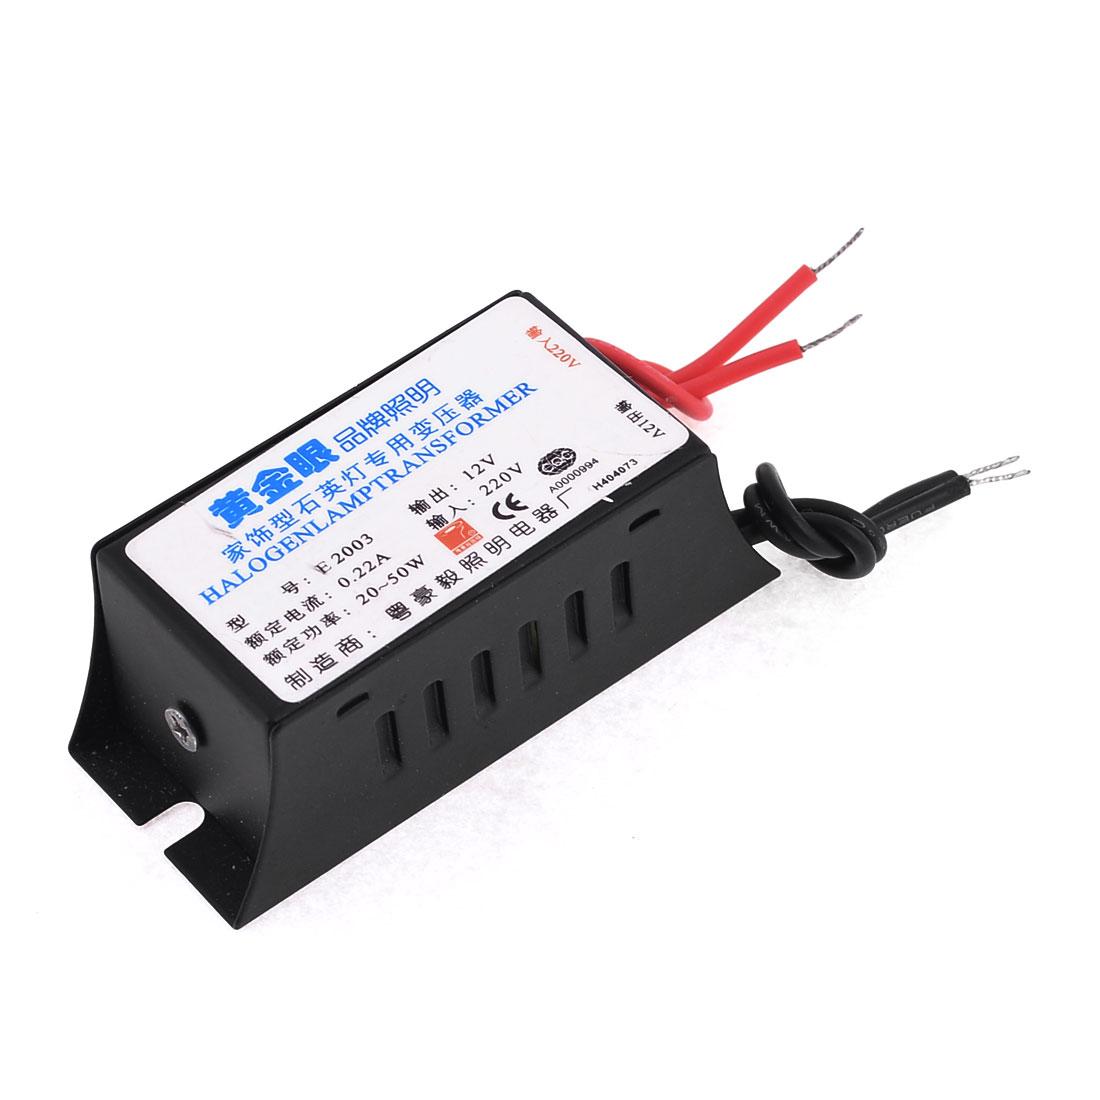 AC 12V 20-50W Output 220VAC Input Converter Electronic Transformer